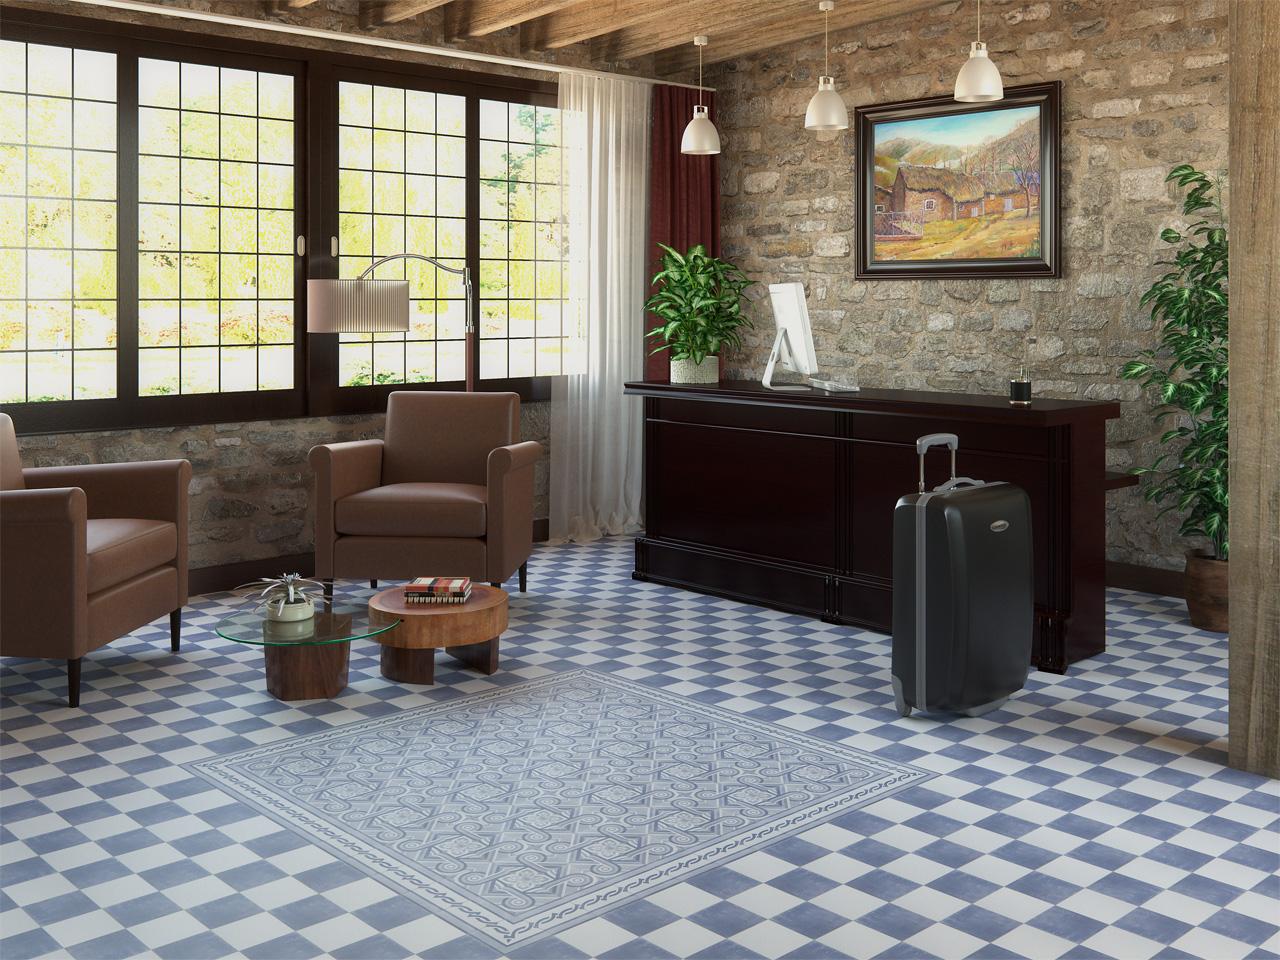 obklad-do-interieru-dekorovany-jednobarevny-matny-15x15-atelier